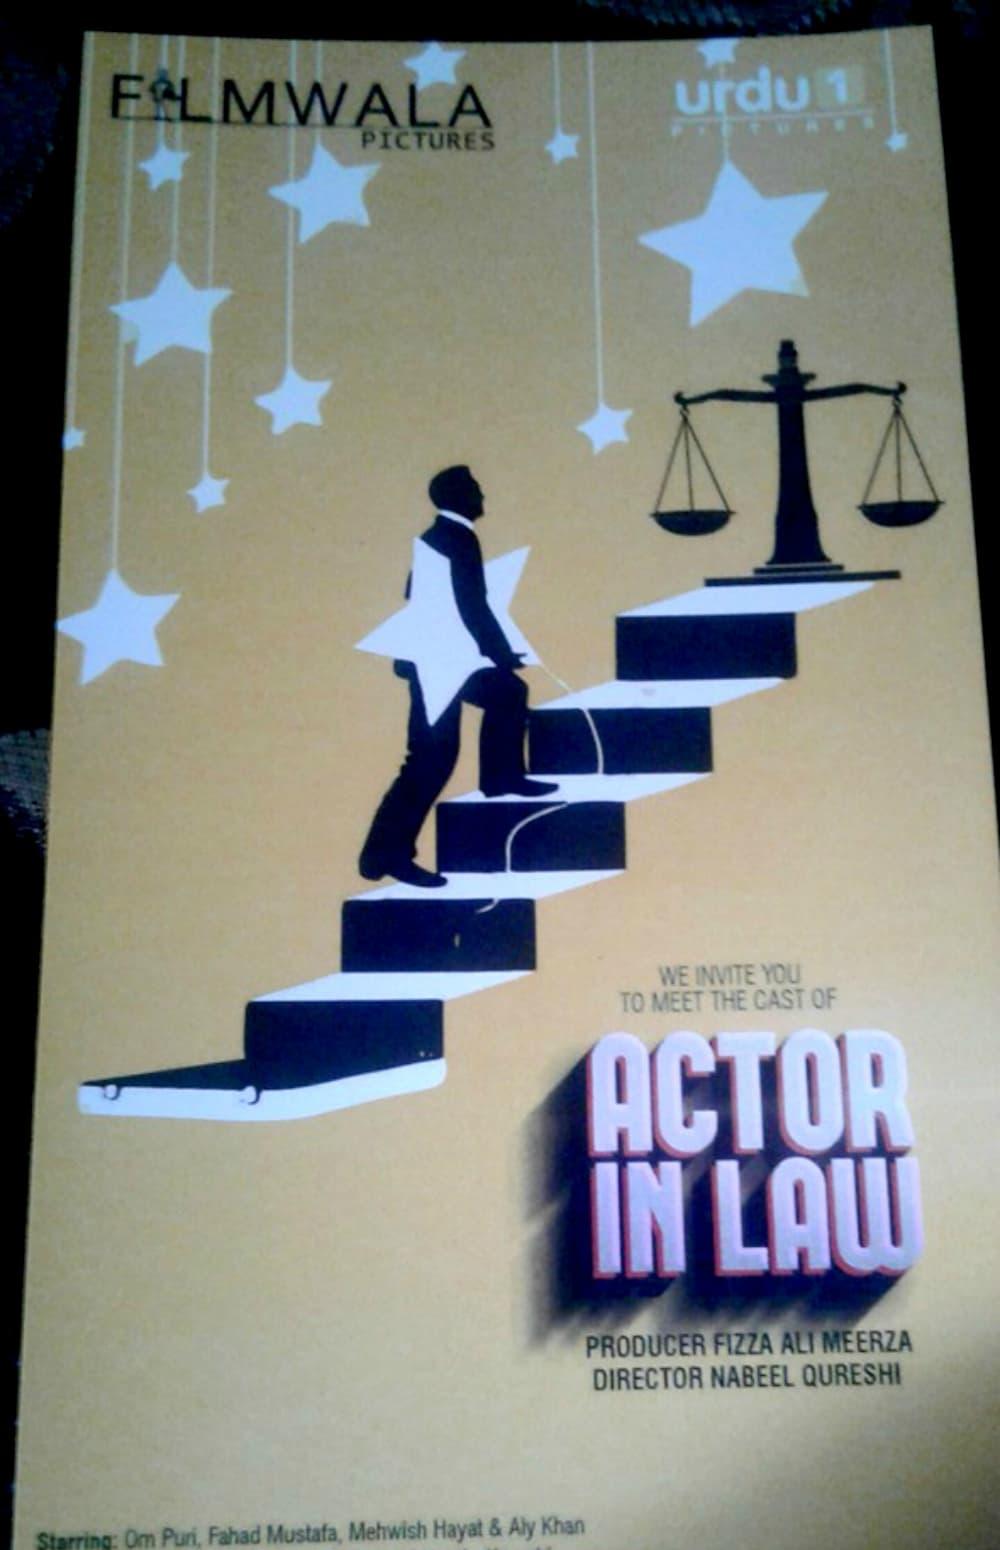 Bollywood veteran Om Puri joins a cast of popular actors Fahad Mustafa, Mehwish Hayat and Alyy Khan in Actor In Law